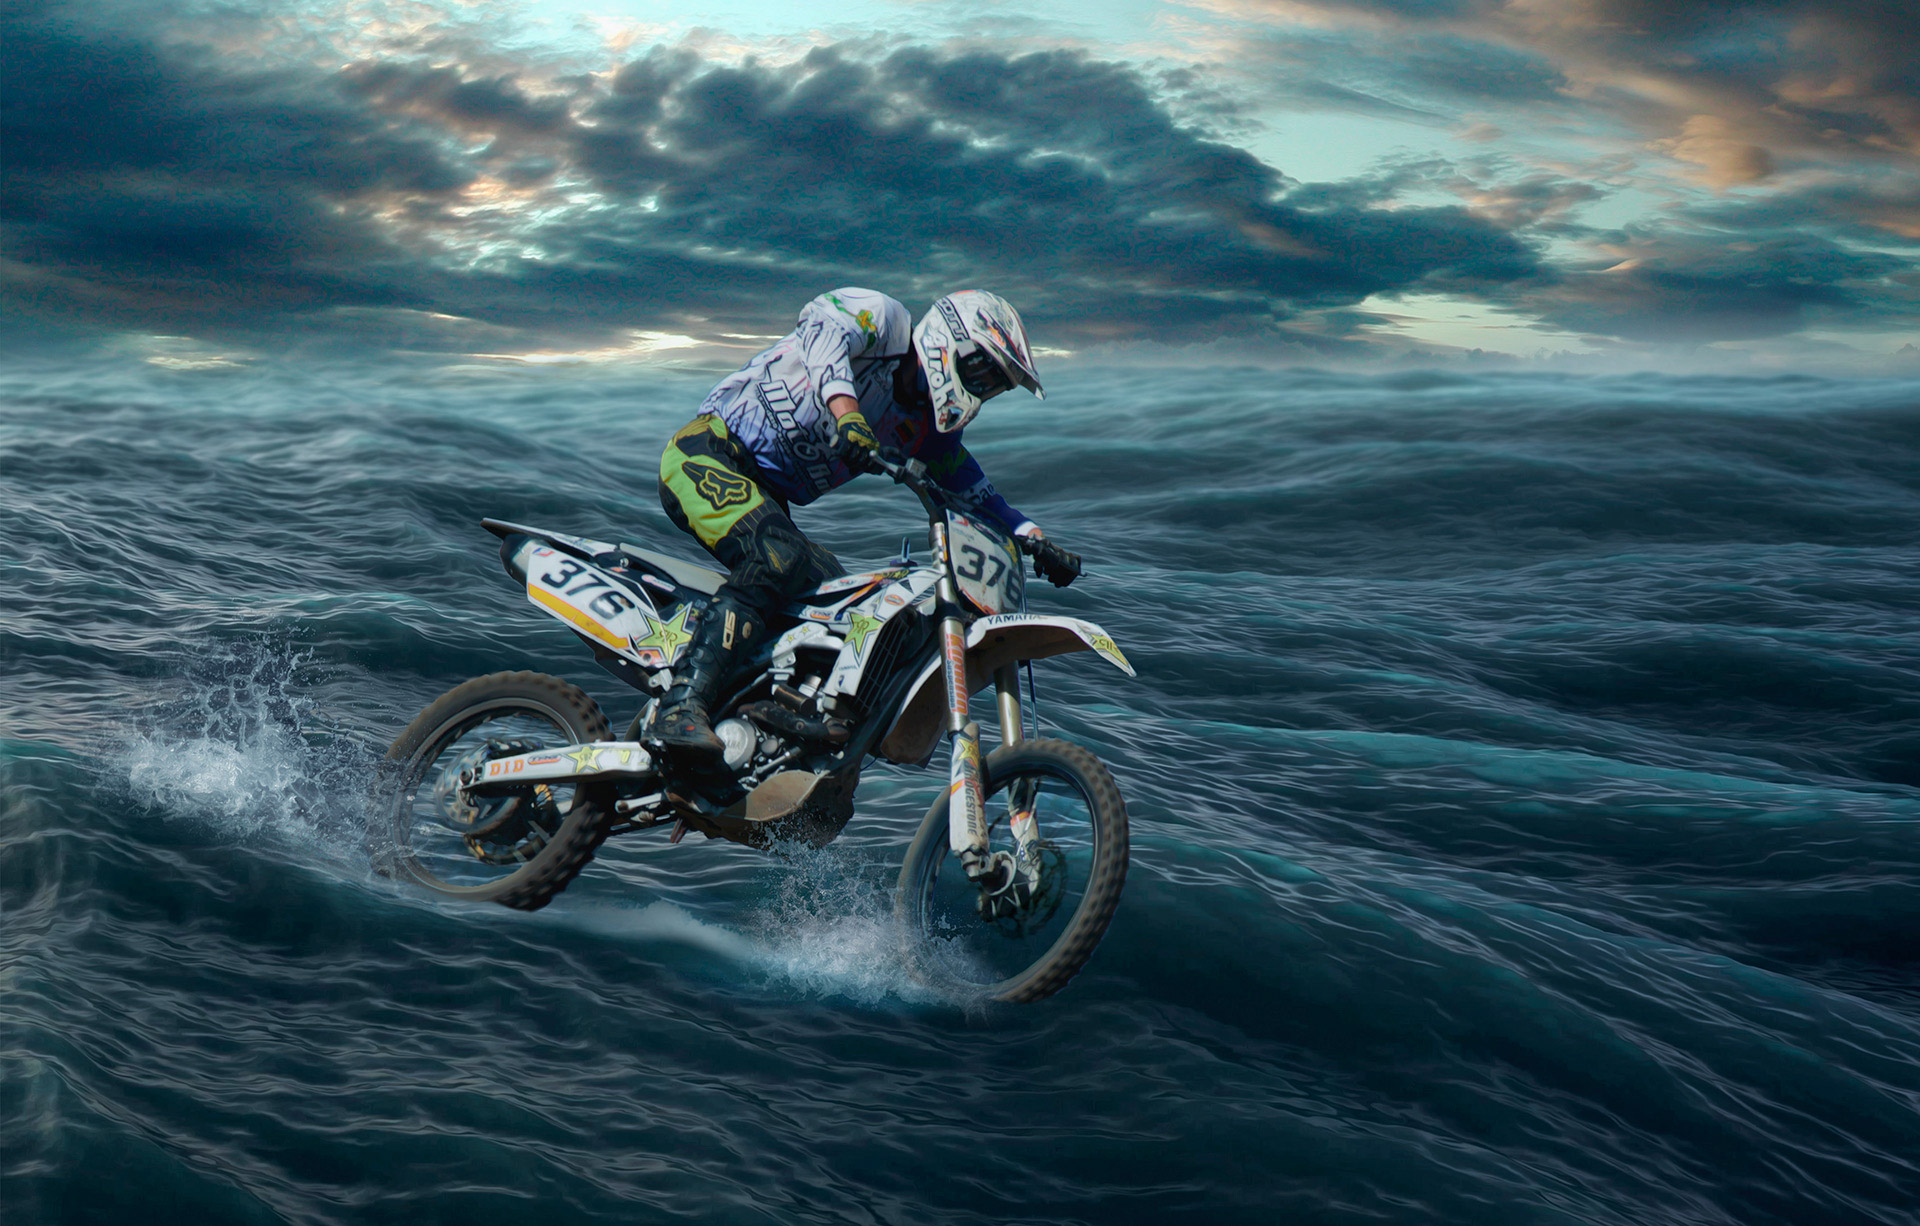 Motocross at sea